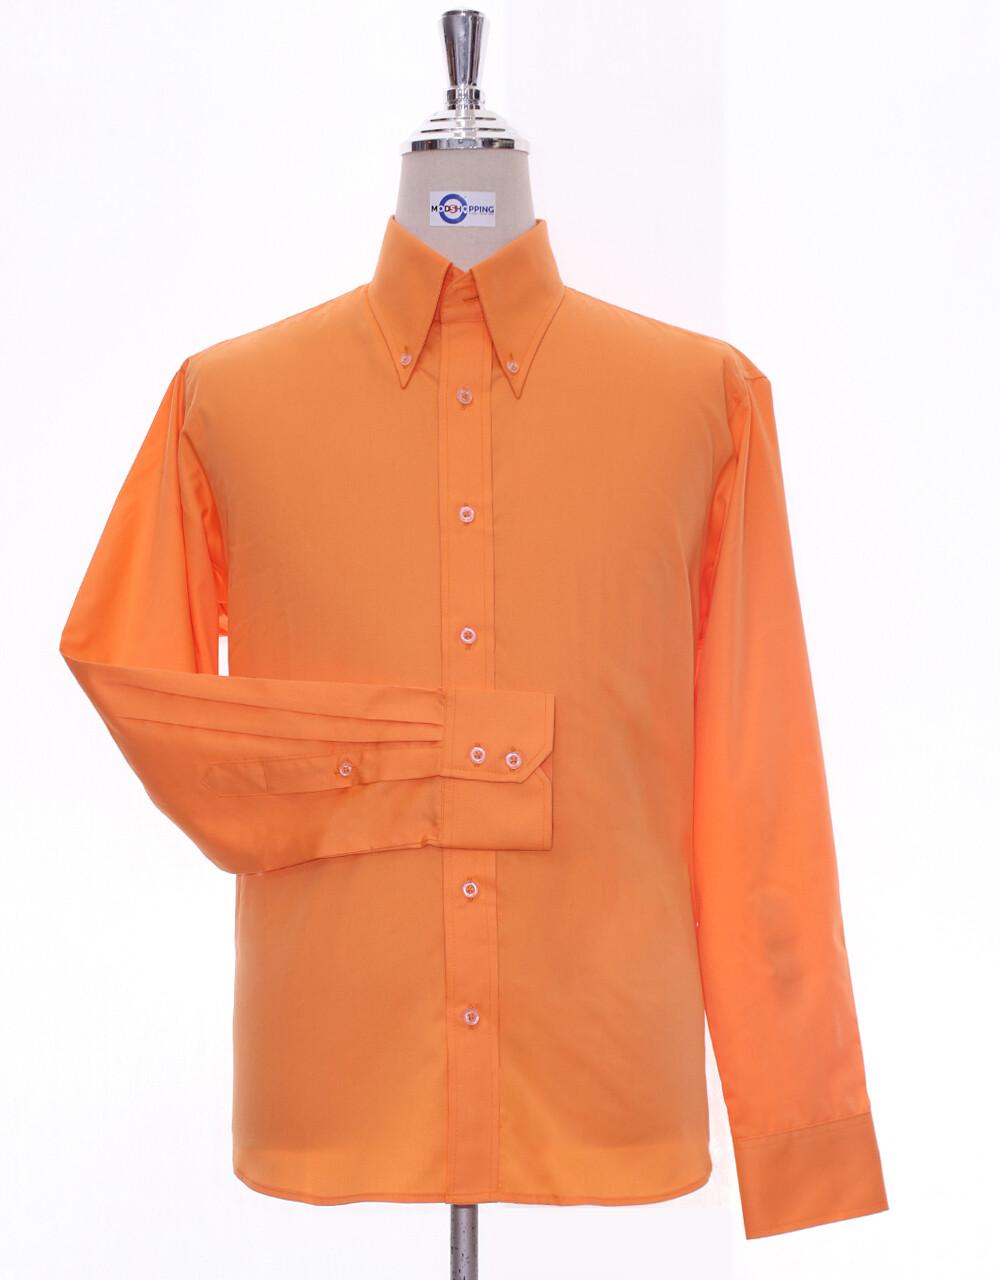 Button Down Collar Shirt | Orange Shirt For Man